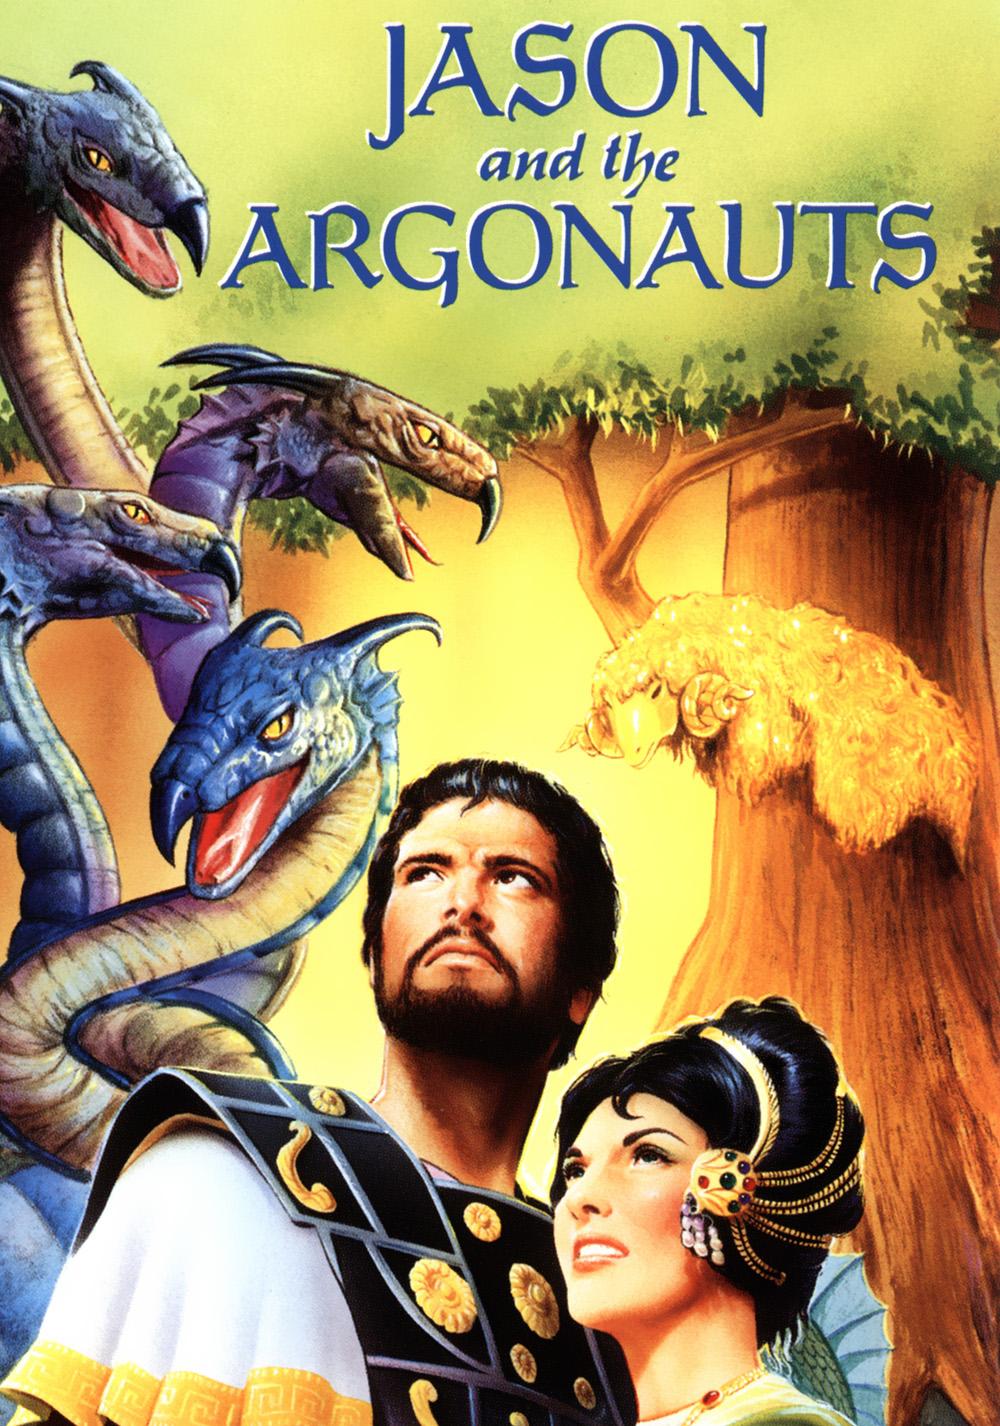 Jason and the Argonauts kapak